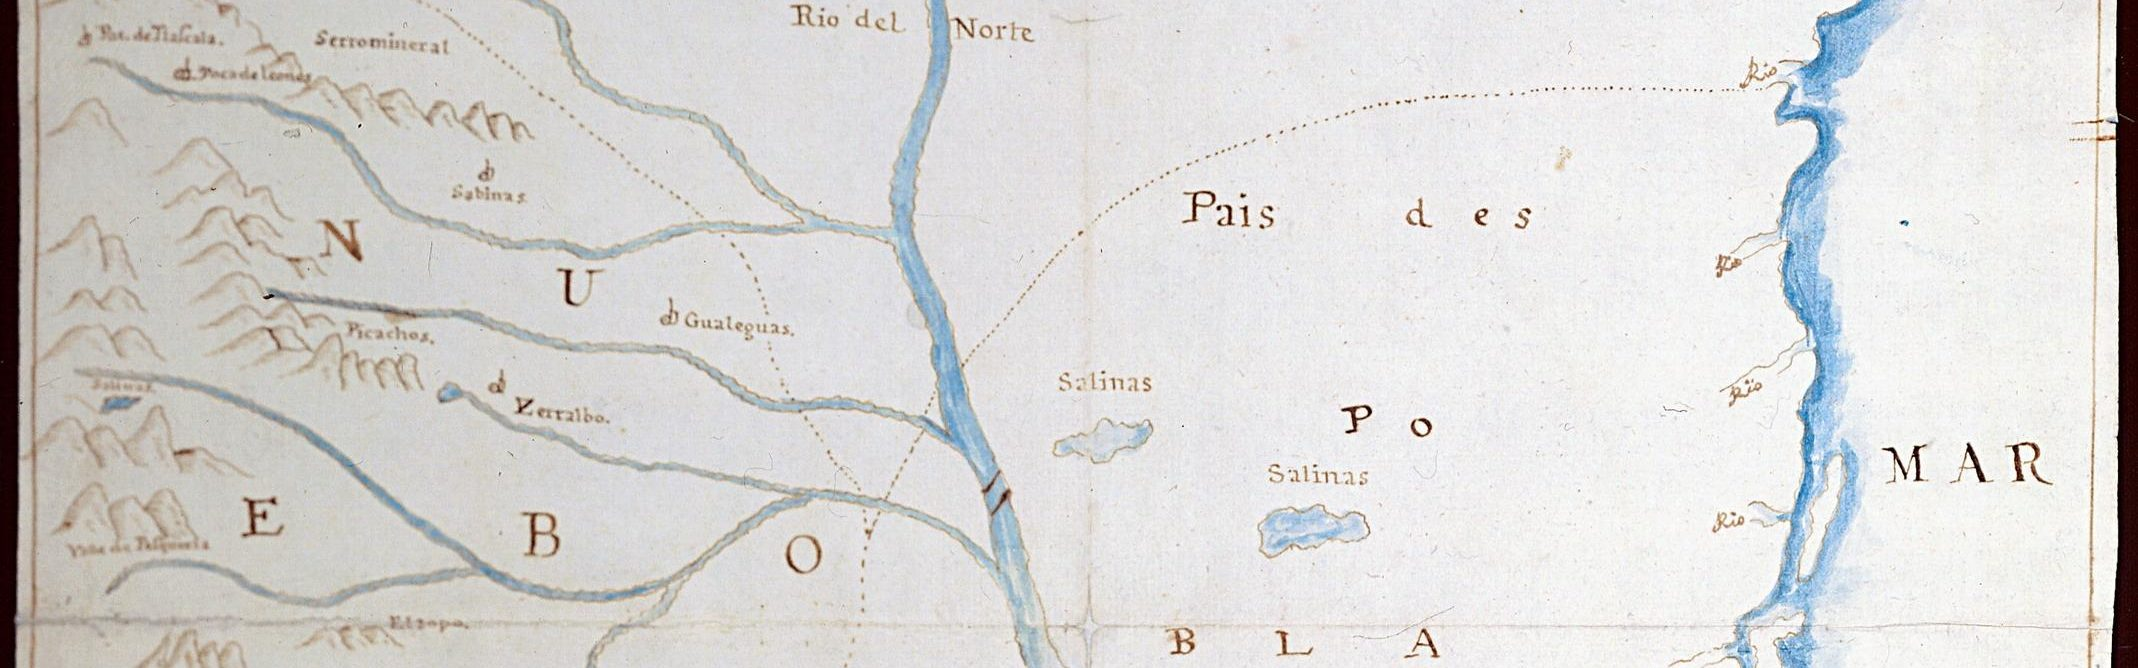 The Iberoamerican Genealogy Society of Texas